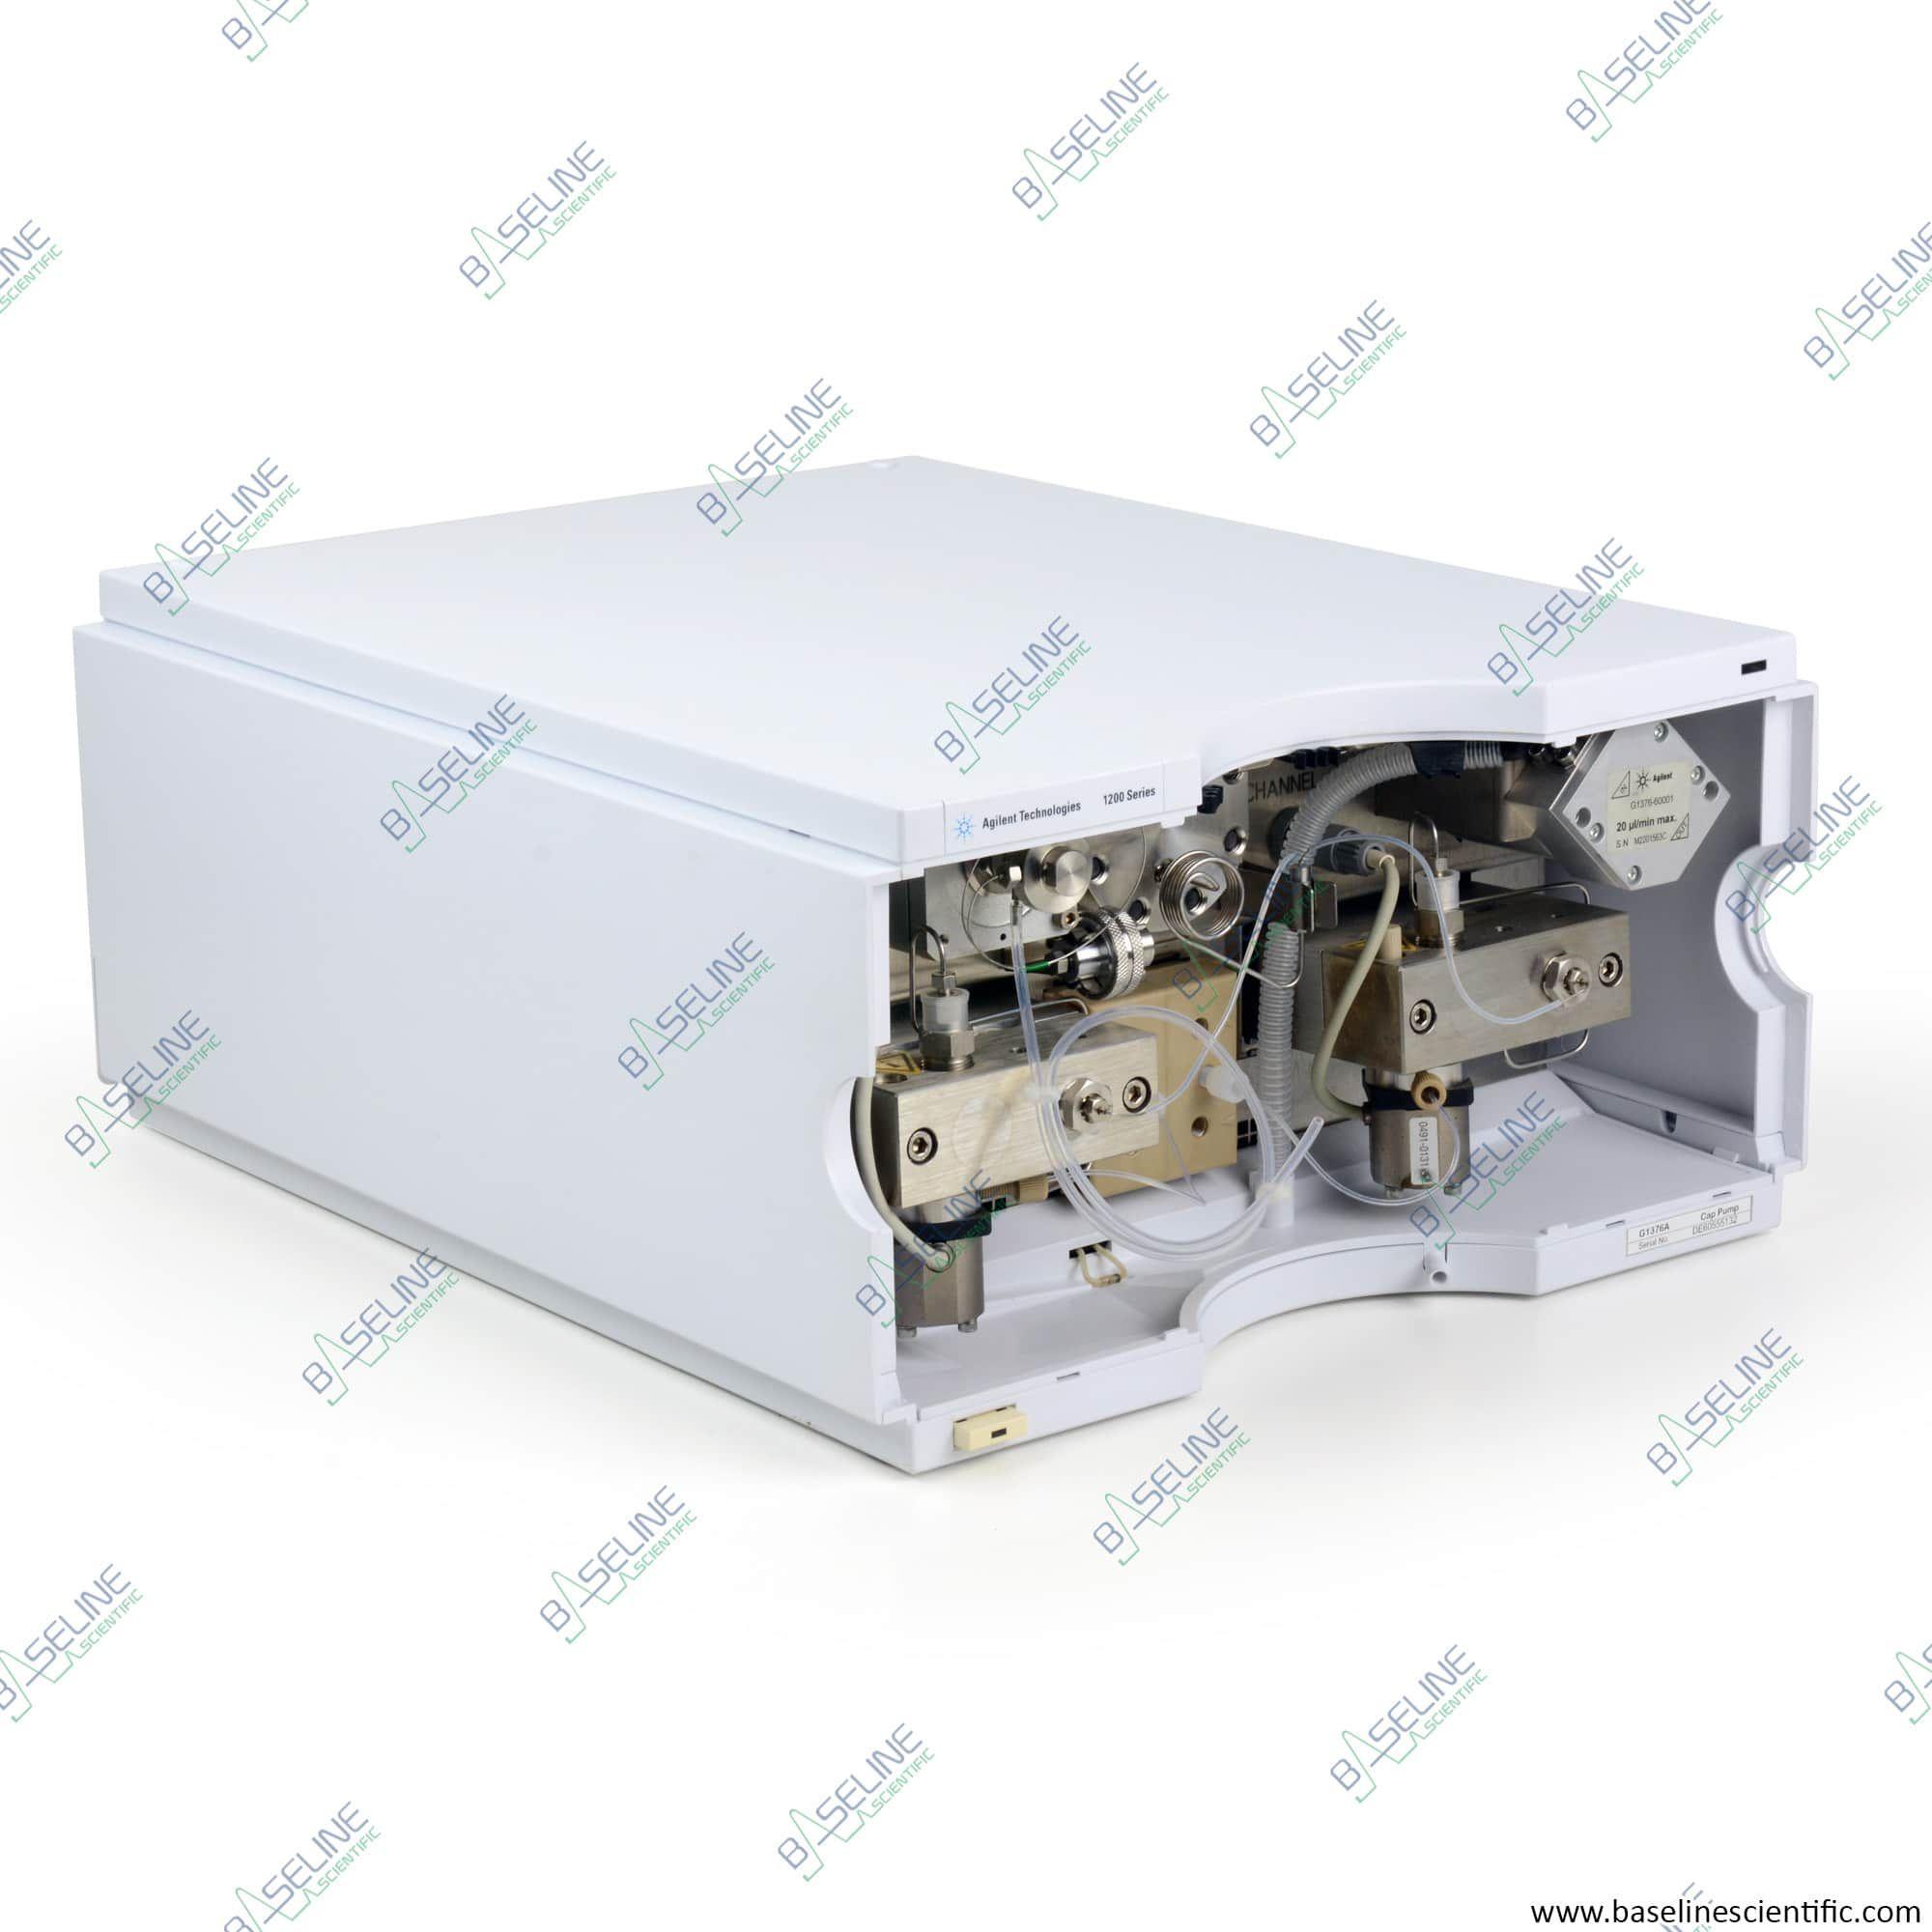 Refurbished Agilent 1200 G1376A Capillary Pump with ONE YEAR WARRANTY